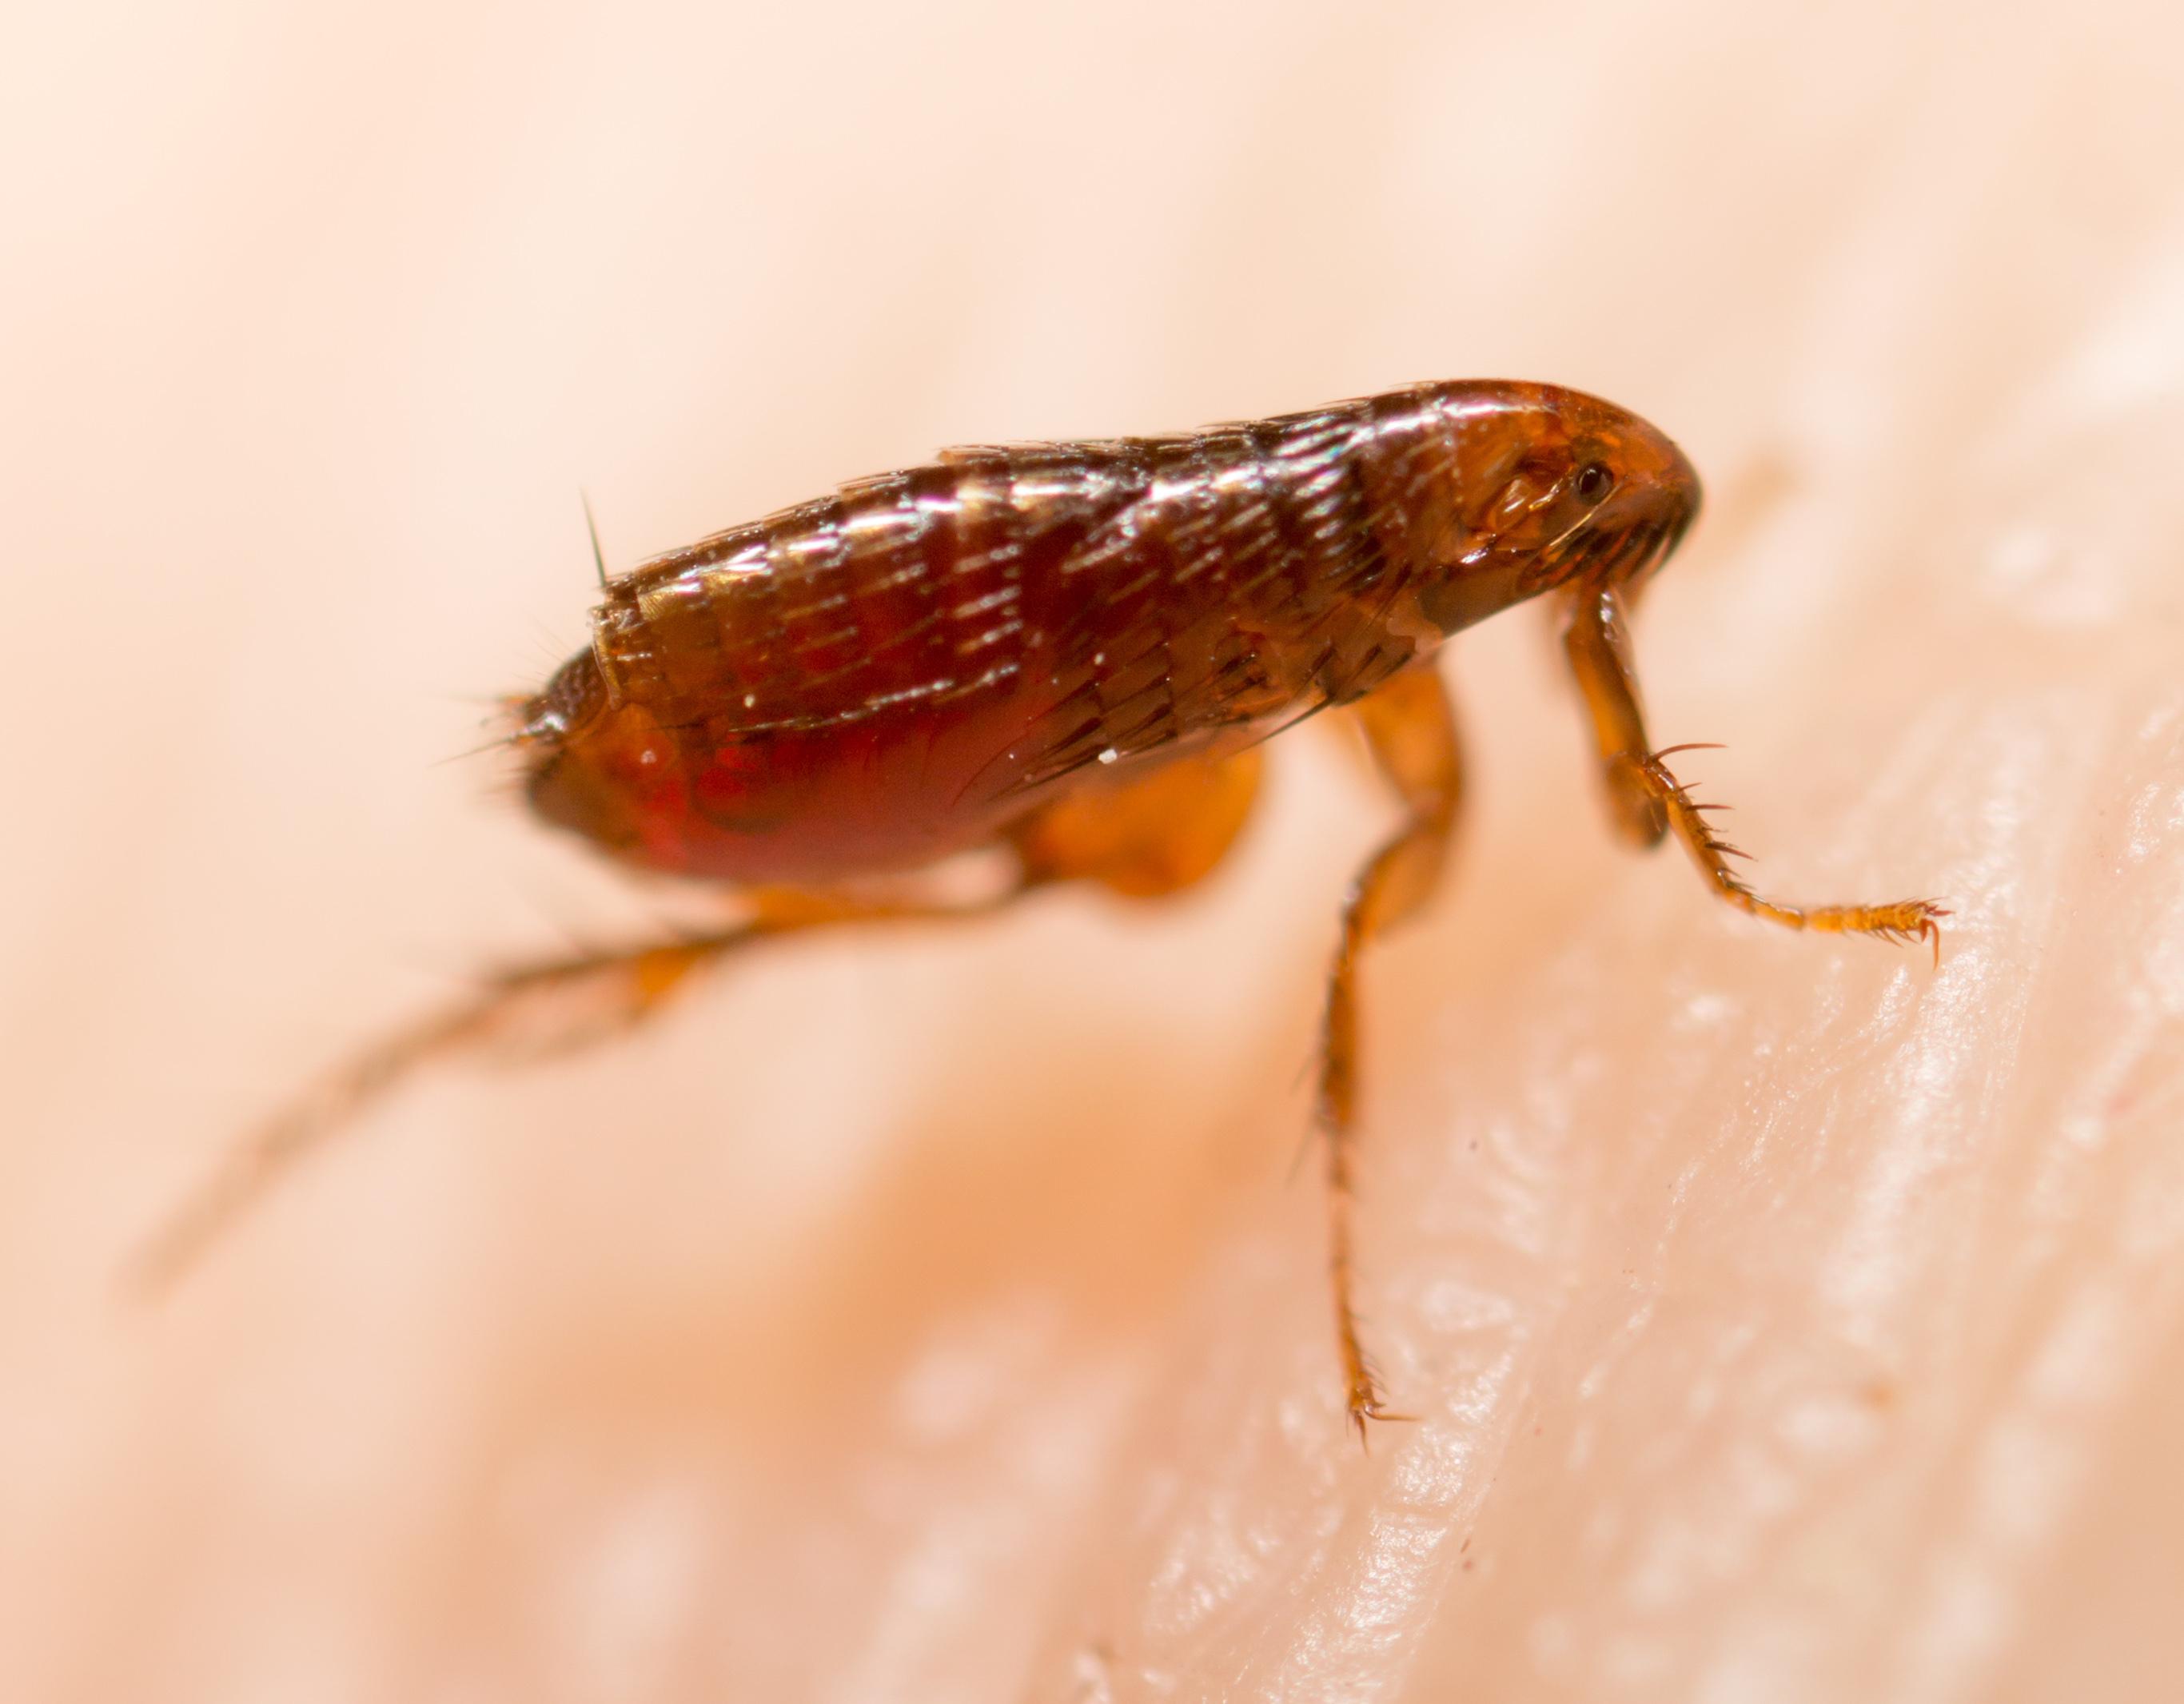 Flea on human skin.